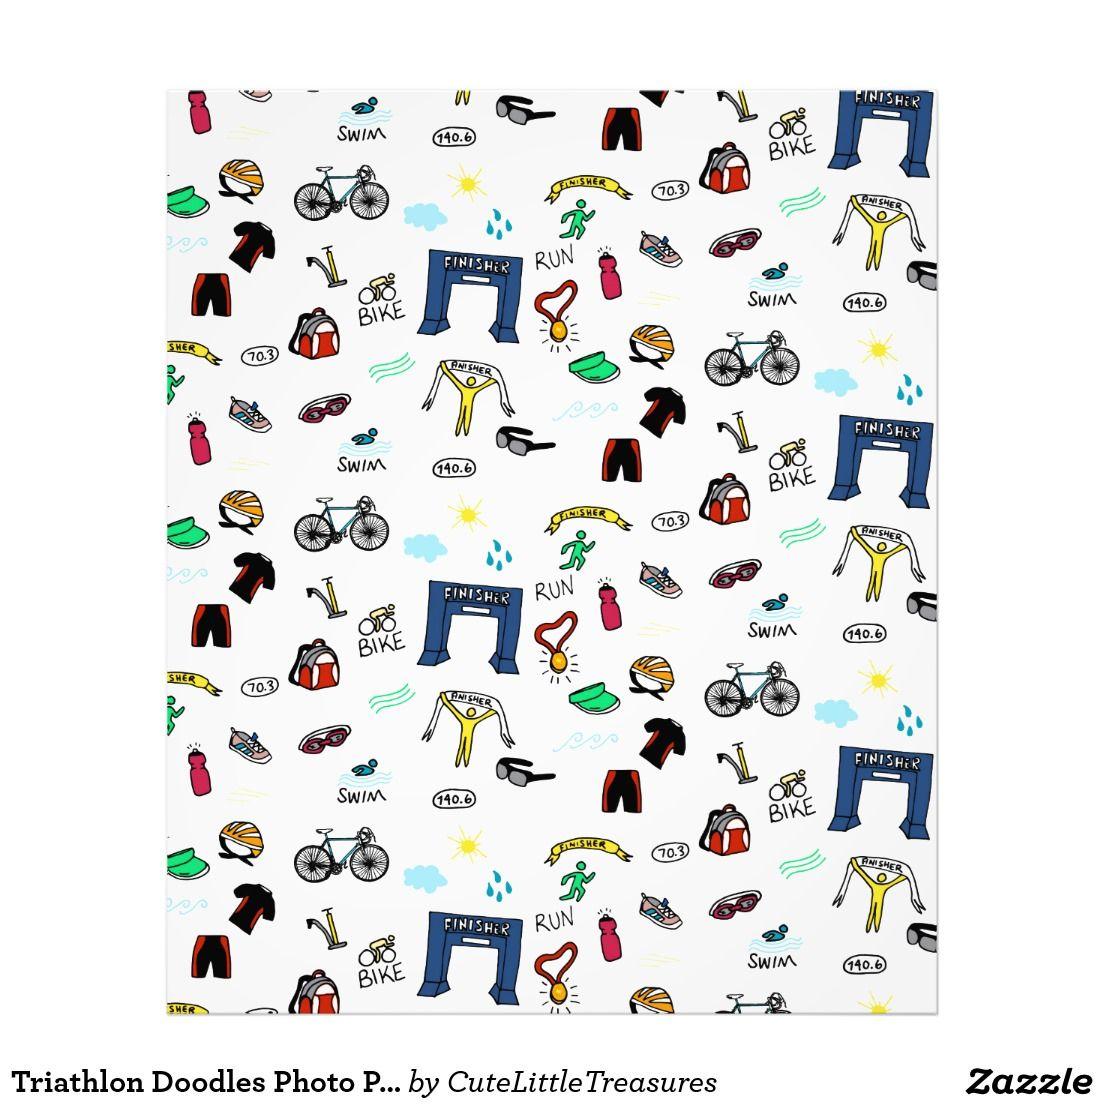 Triathlon Doodles Photo Print